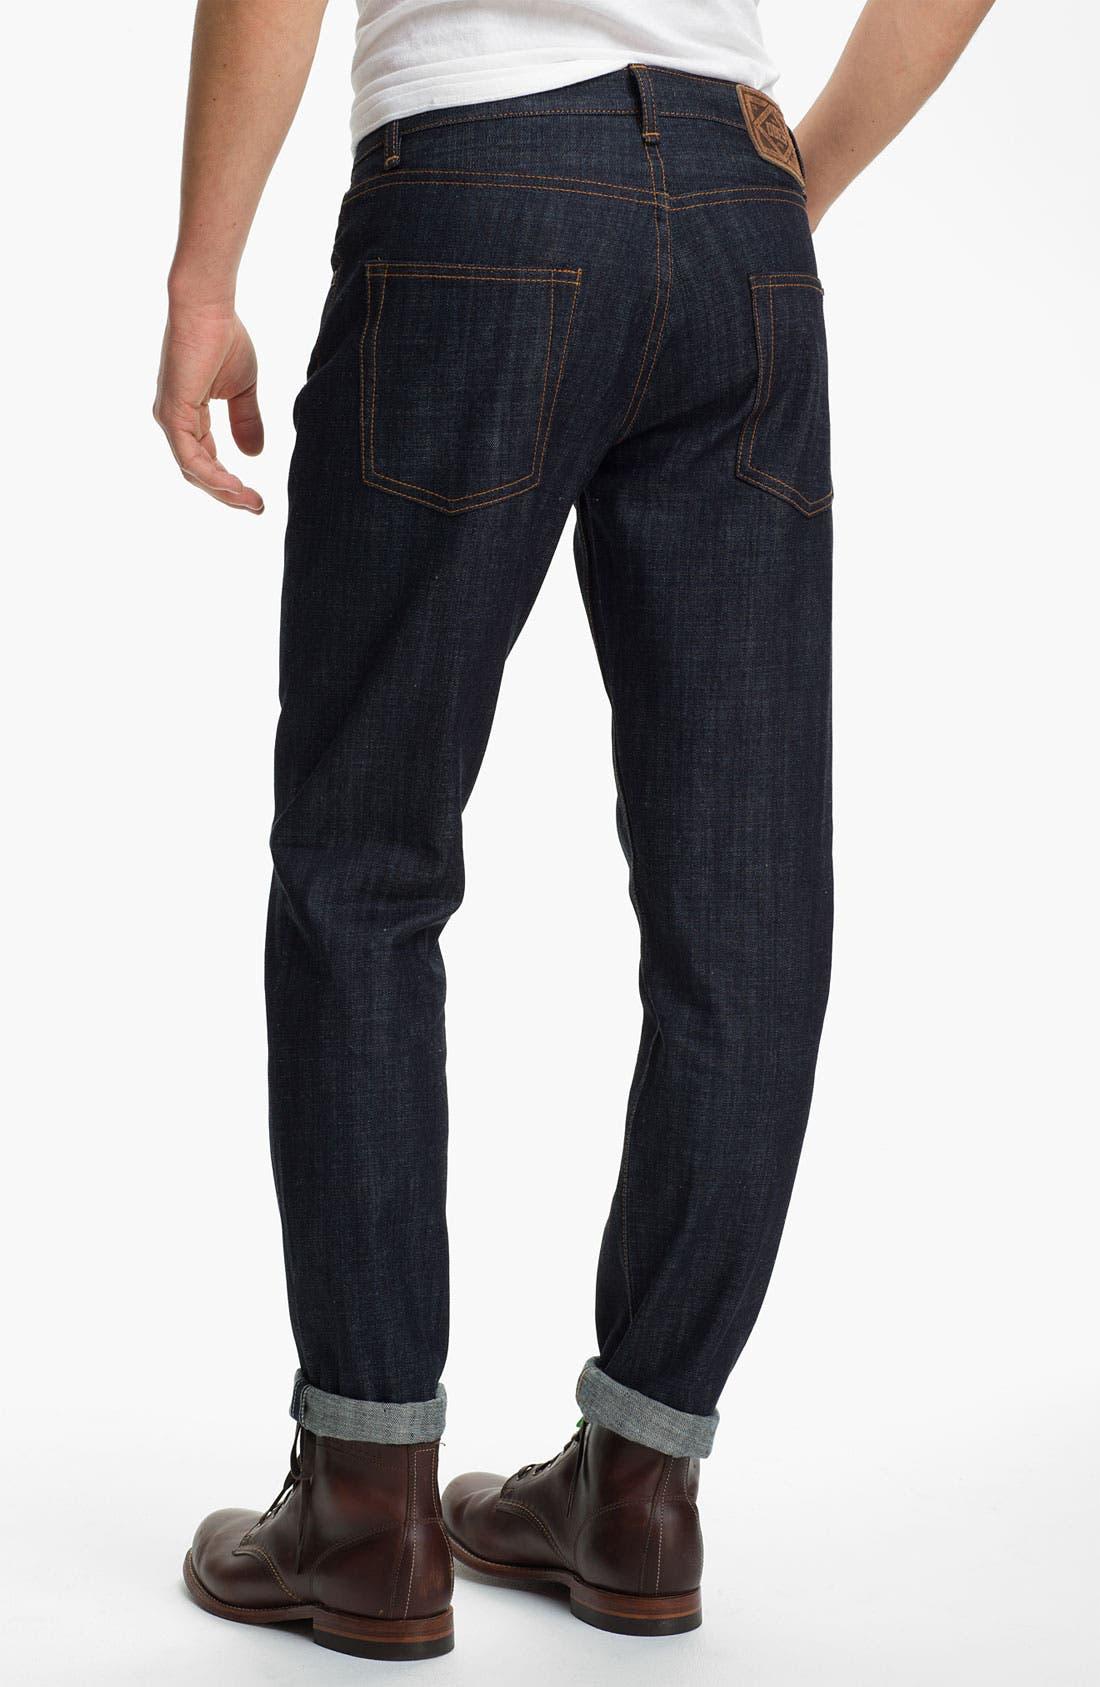 Alternate Image 1 Selected - Obey 'Standard Issue' Slim Straight Leg Jeans (Raw Indigo)